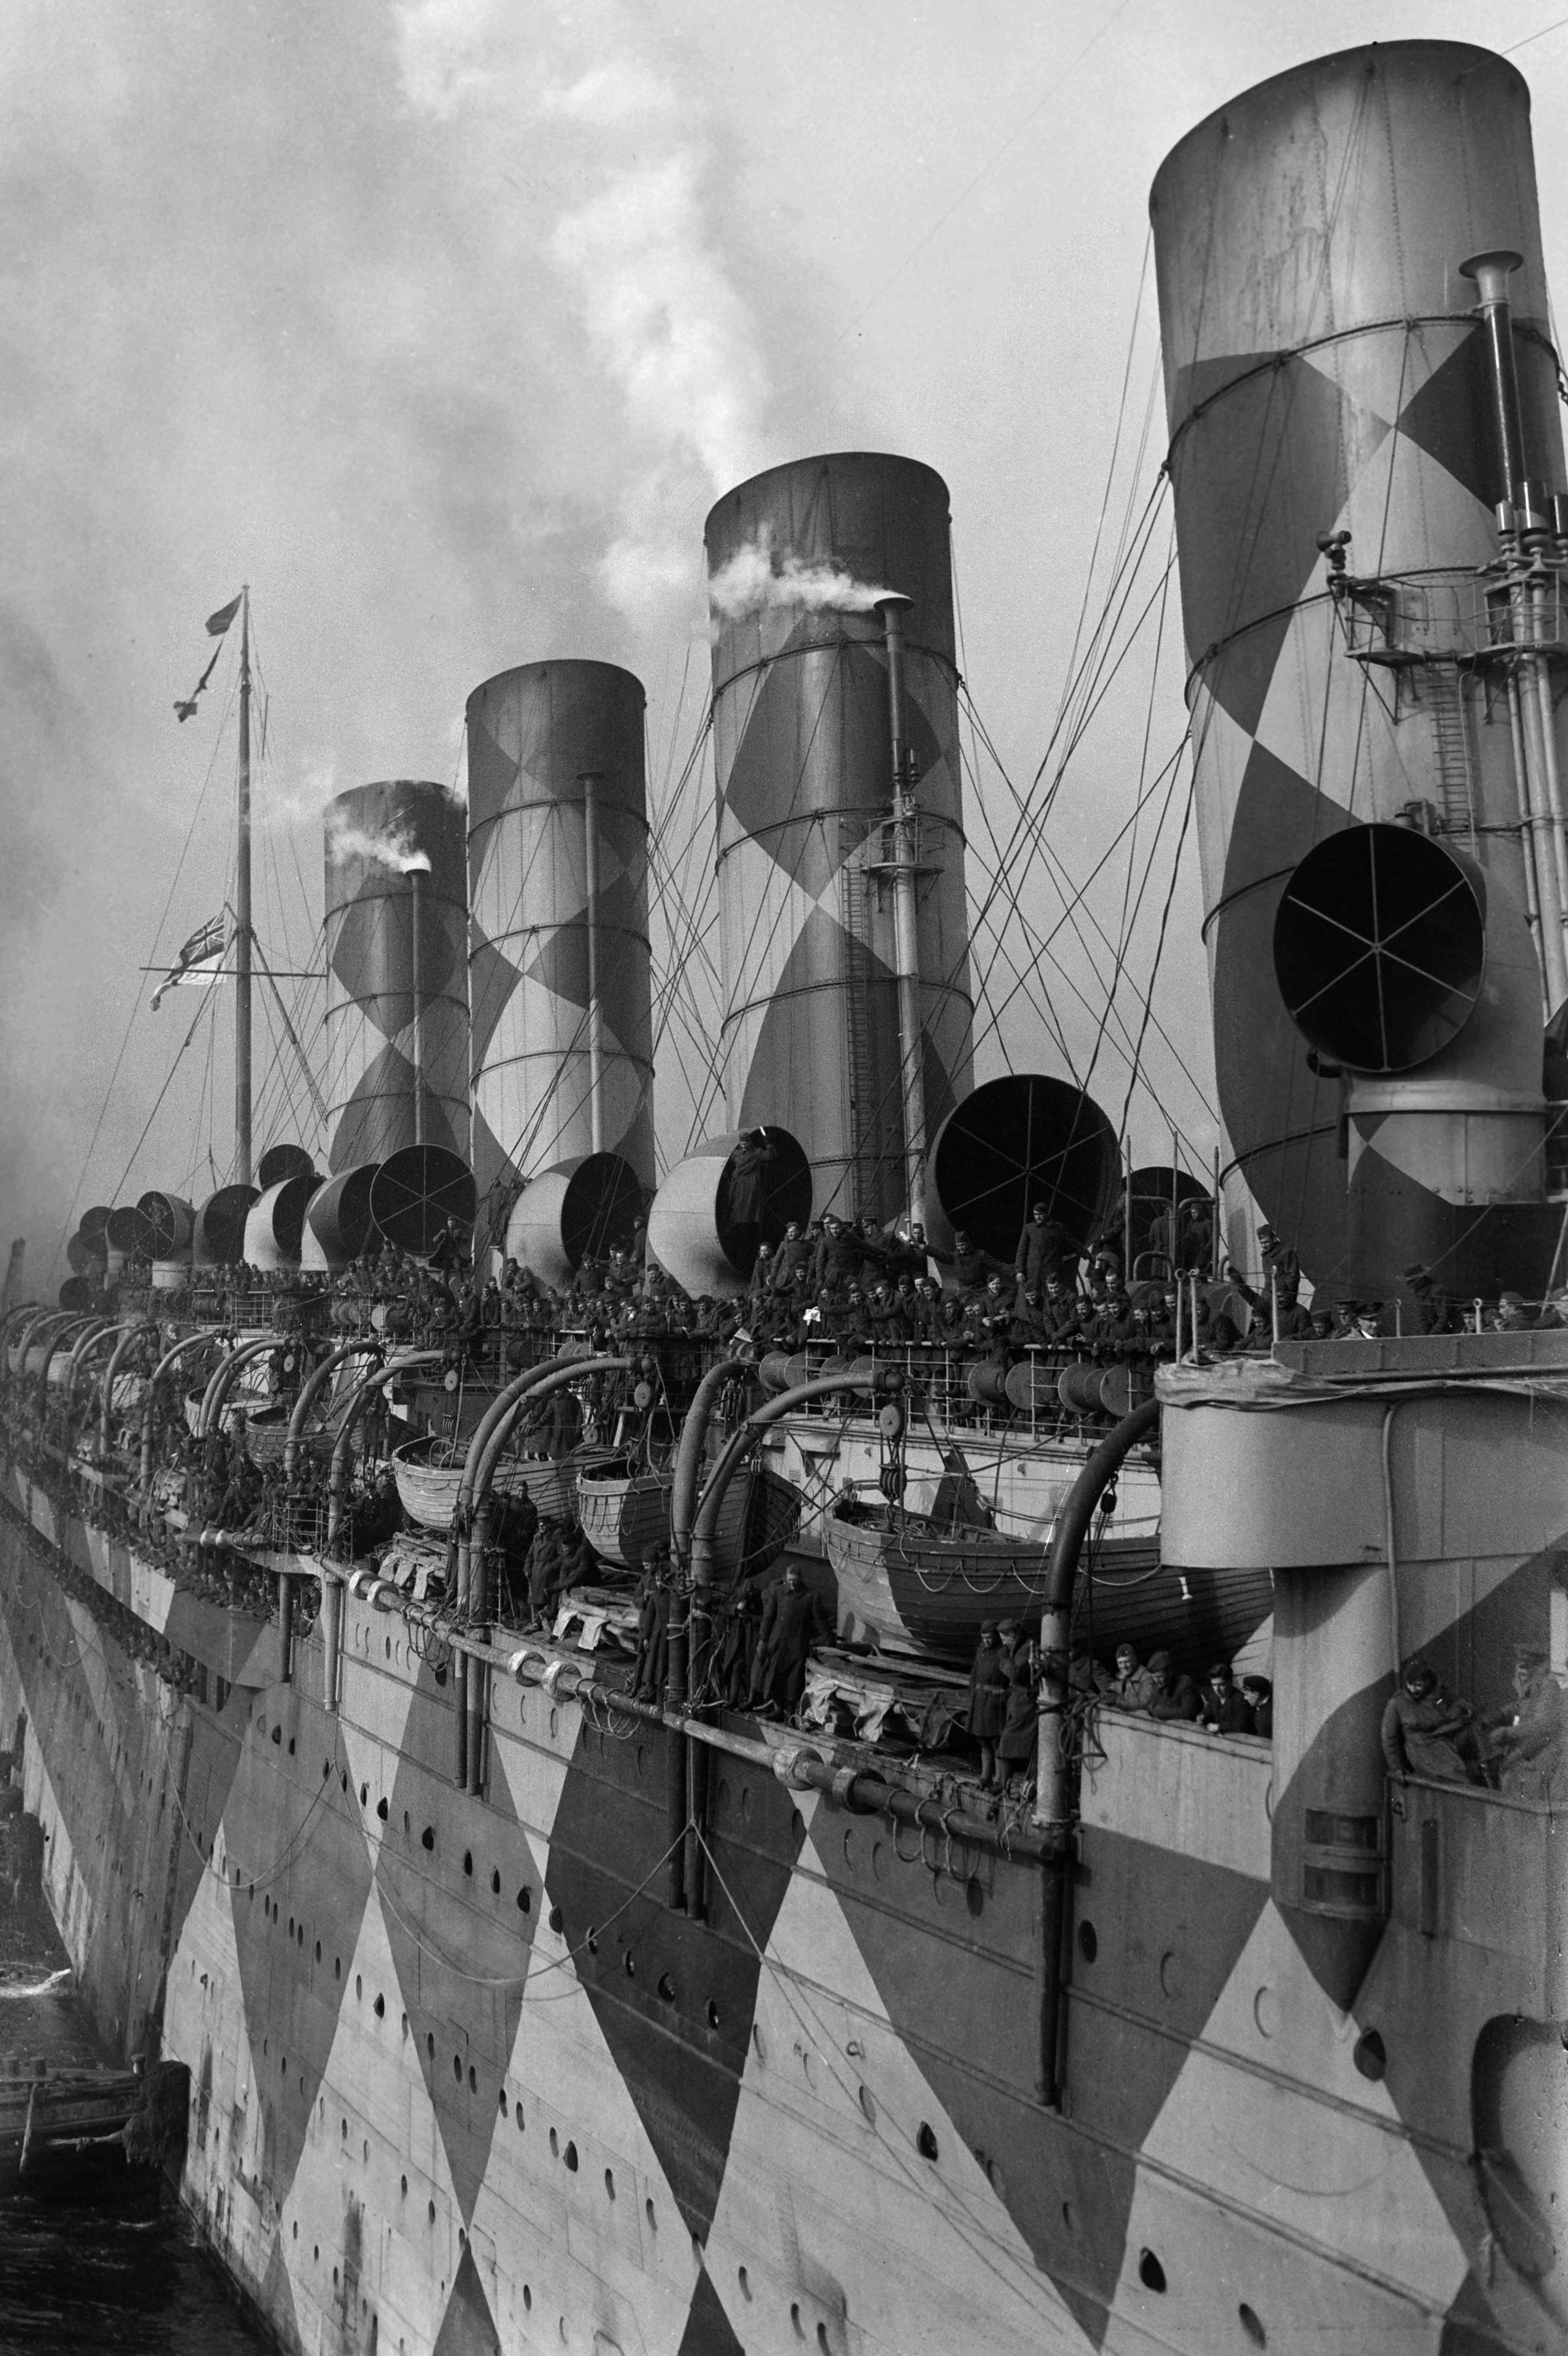 dazzle-ship-mauretania-3.jpg